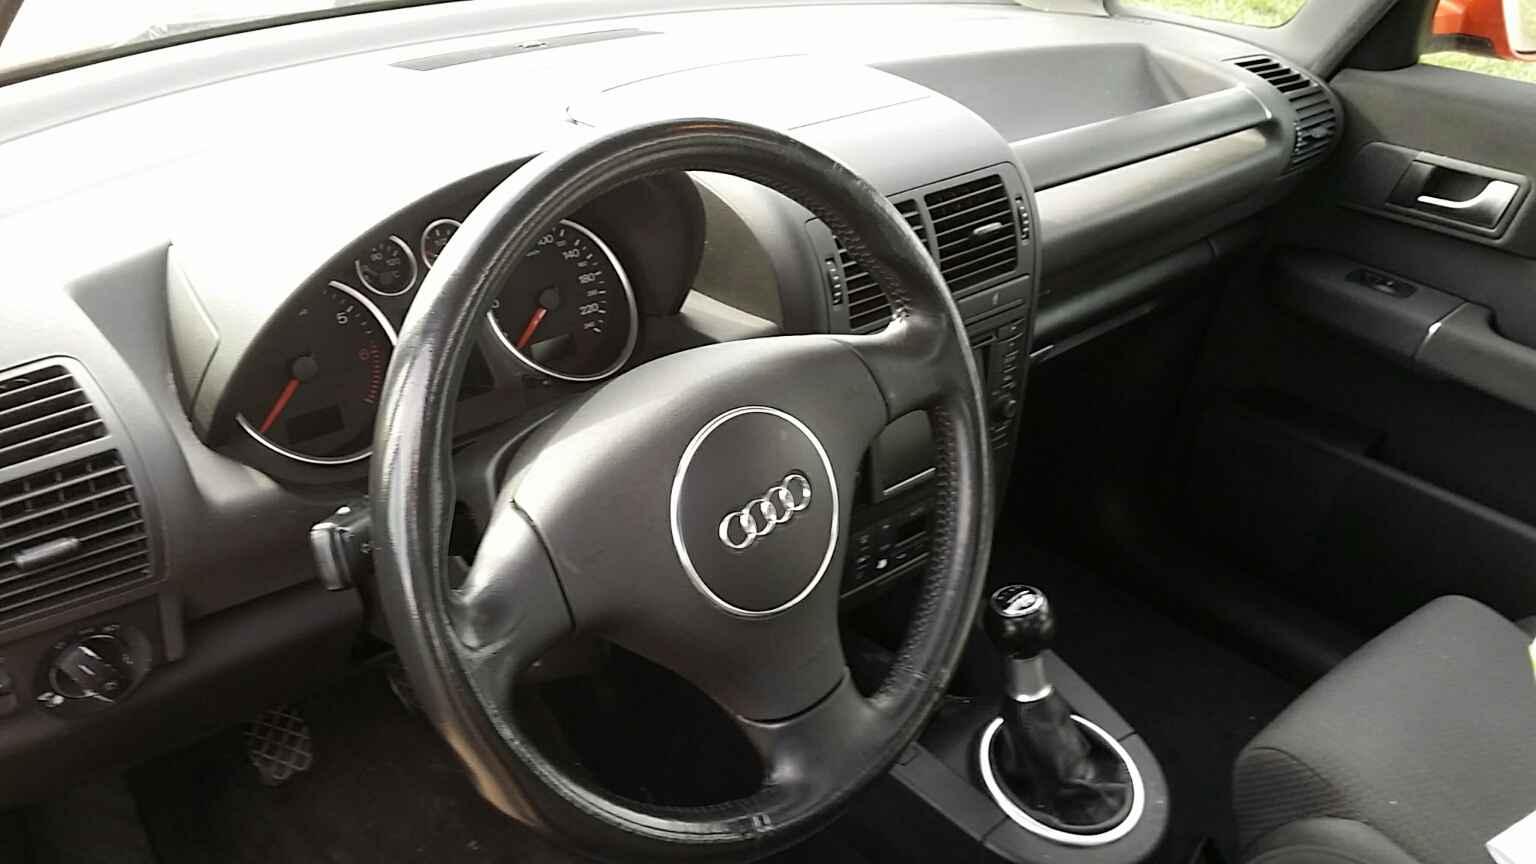 Audi08.jpg.d471adcebcc3e44eb5f9246ec902385f.jpg